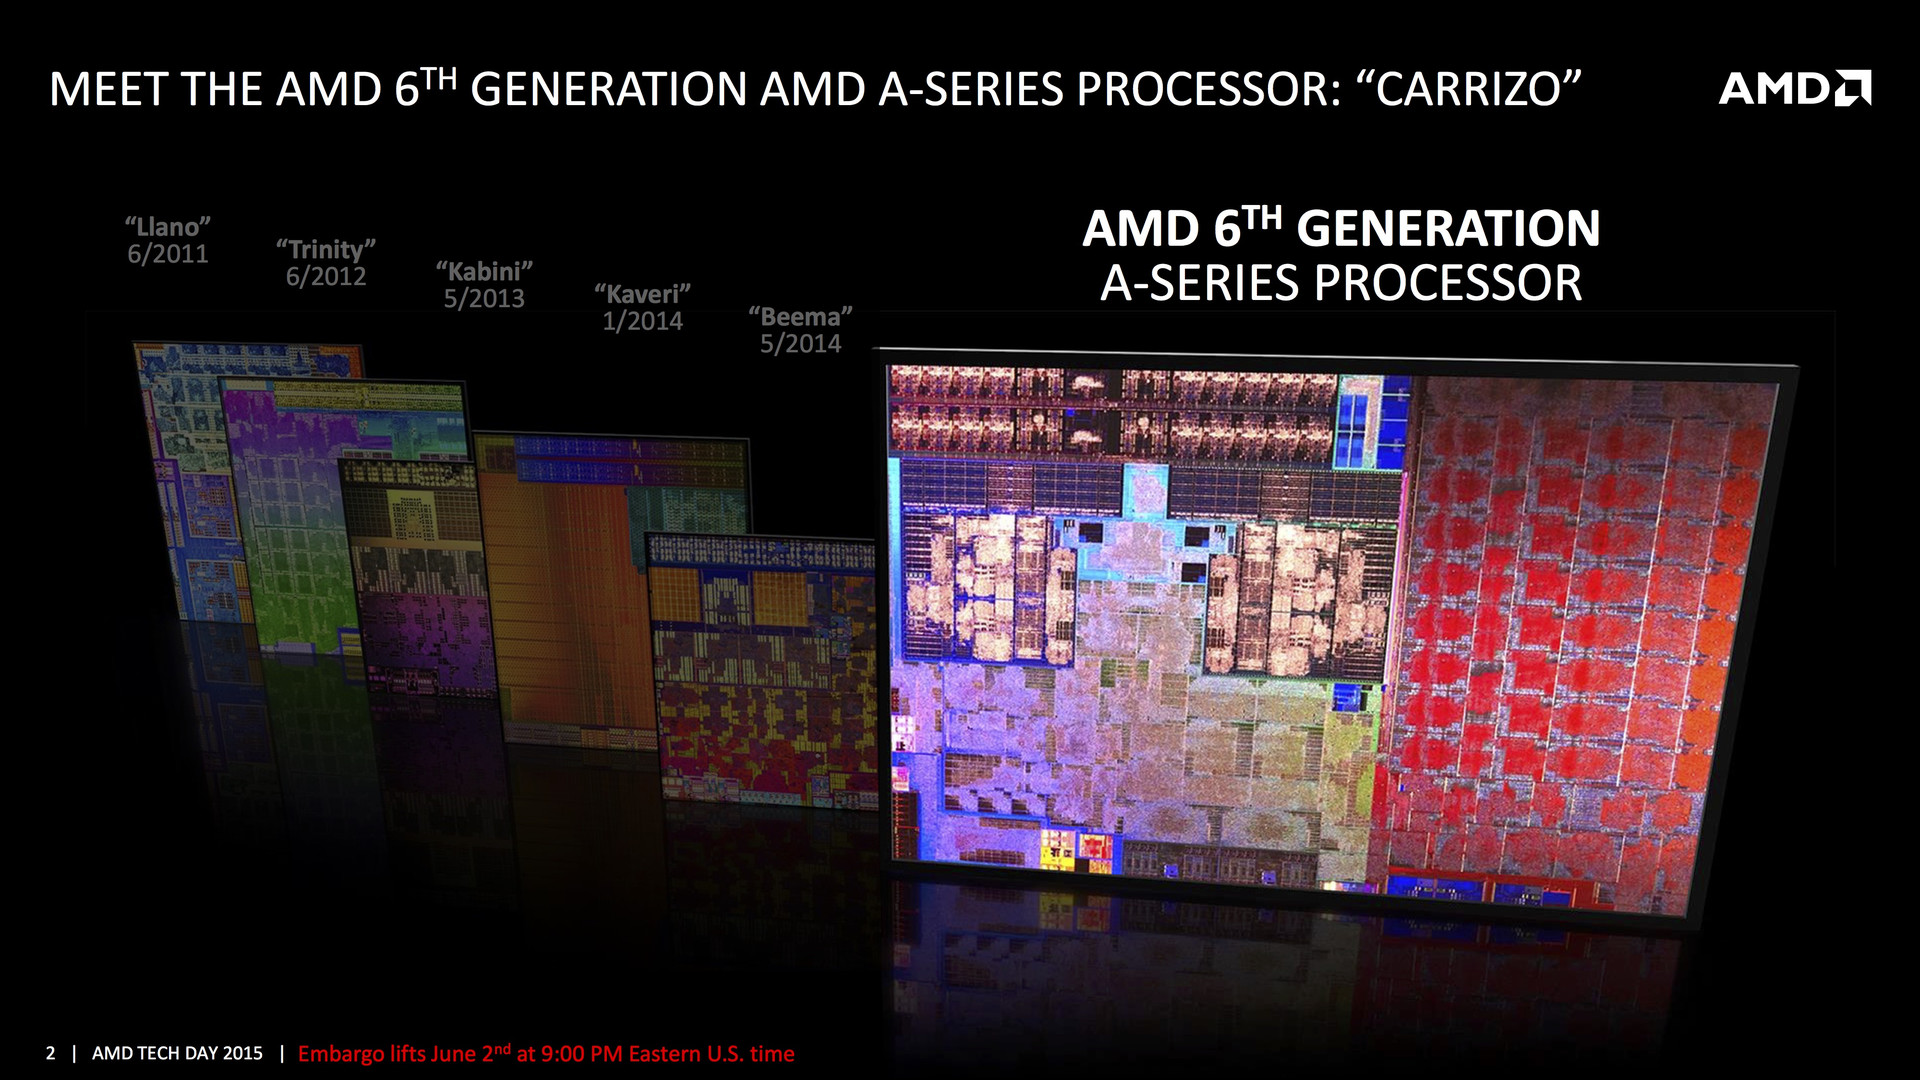 csm_carrizo_apu_generations_e4359716ef